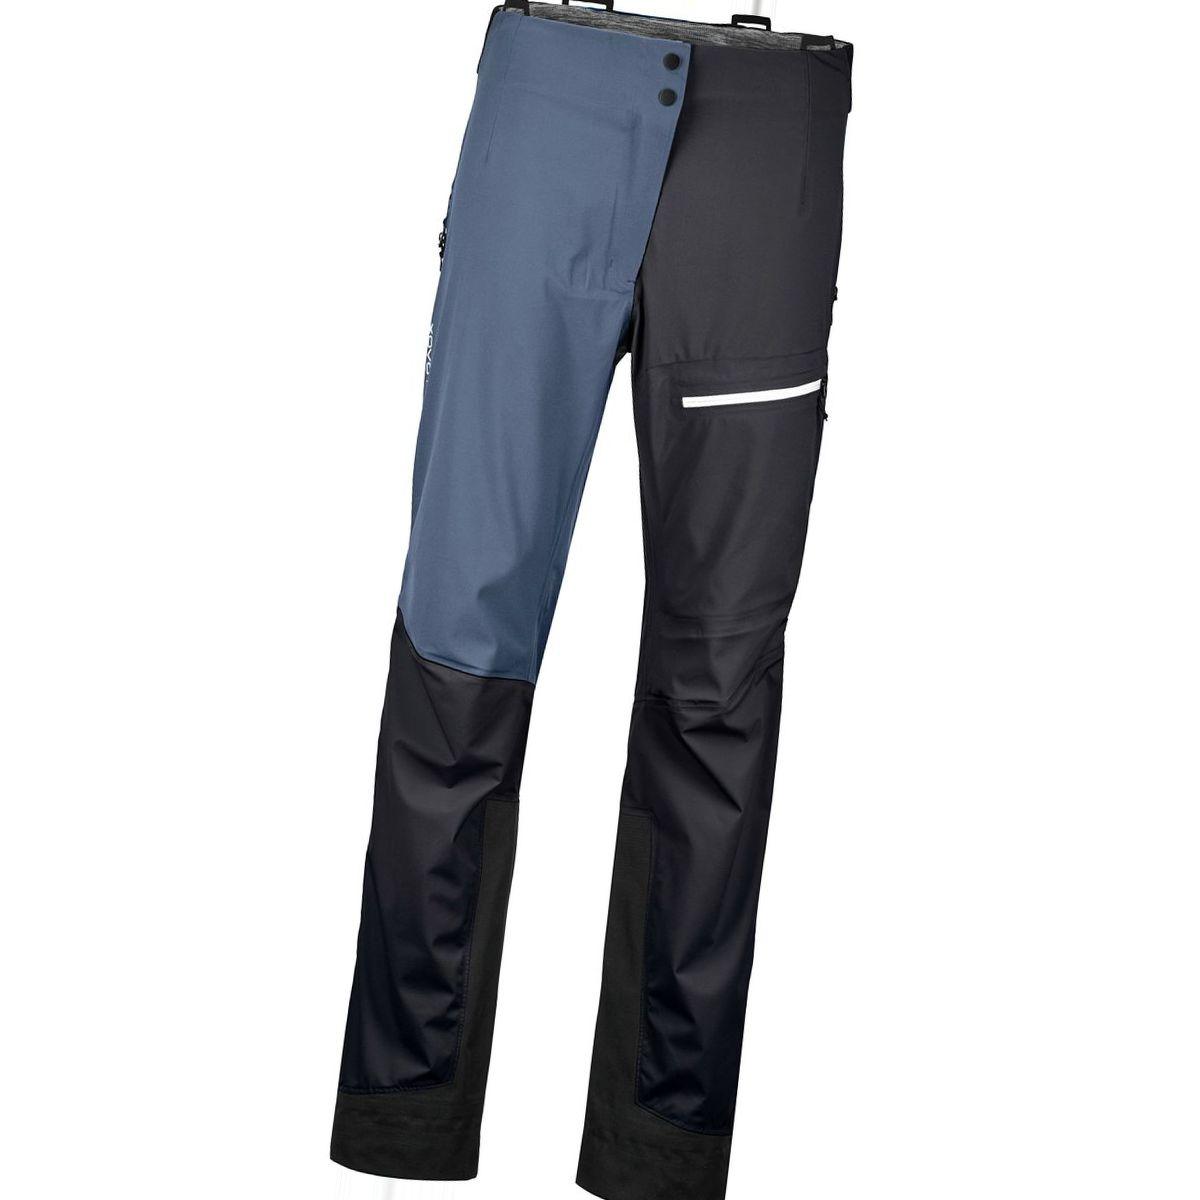 Ortovox 3L Ortler Pant - Men's